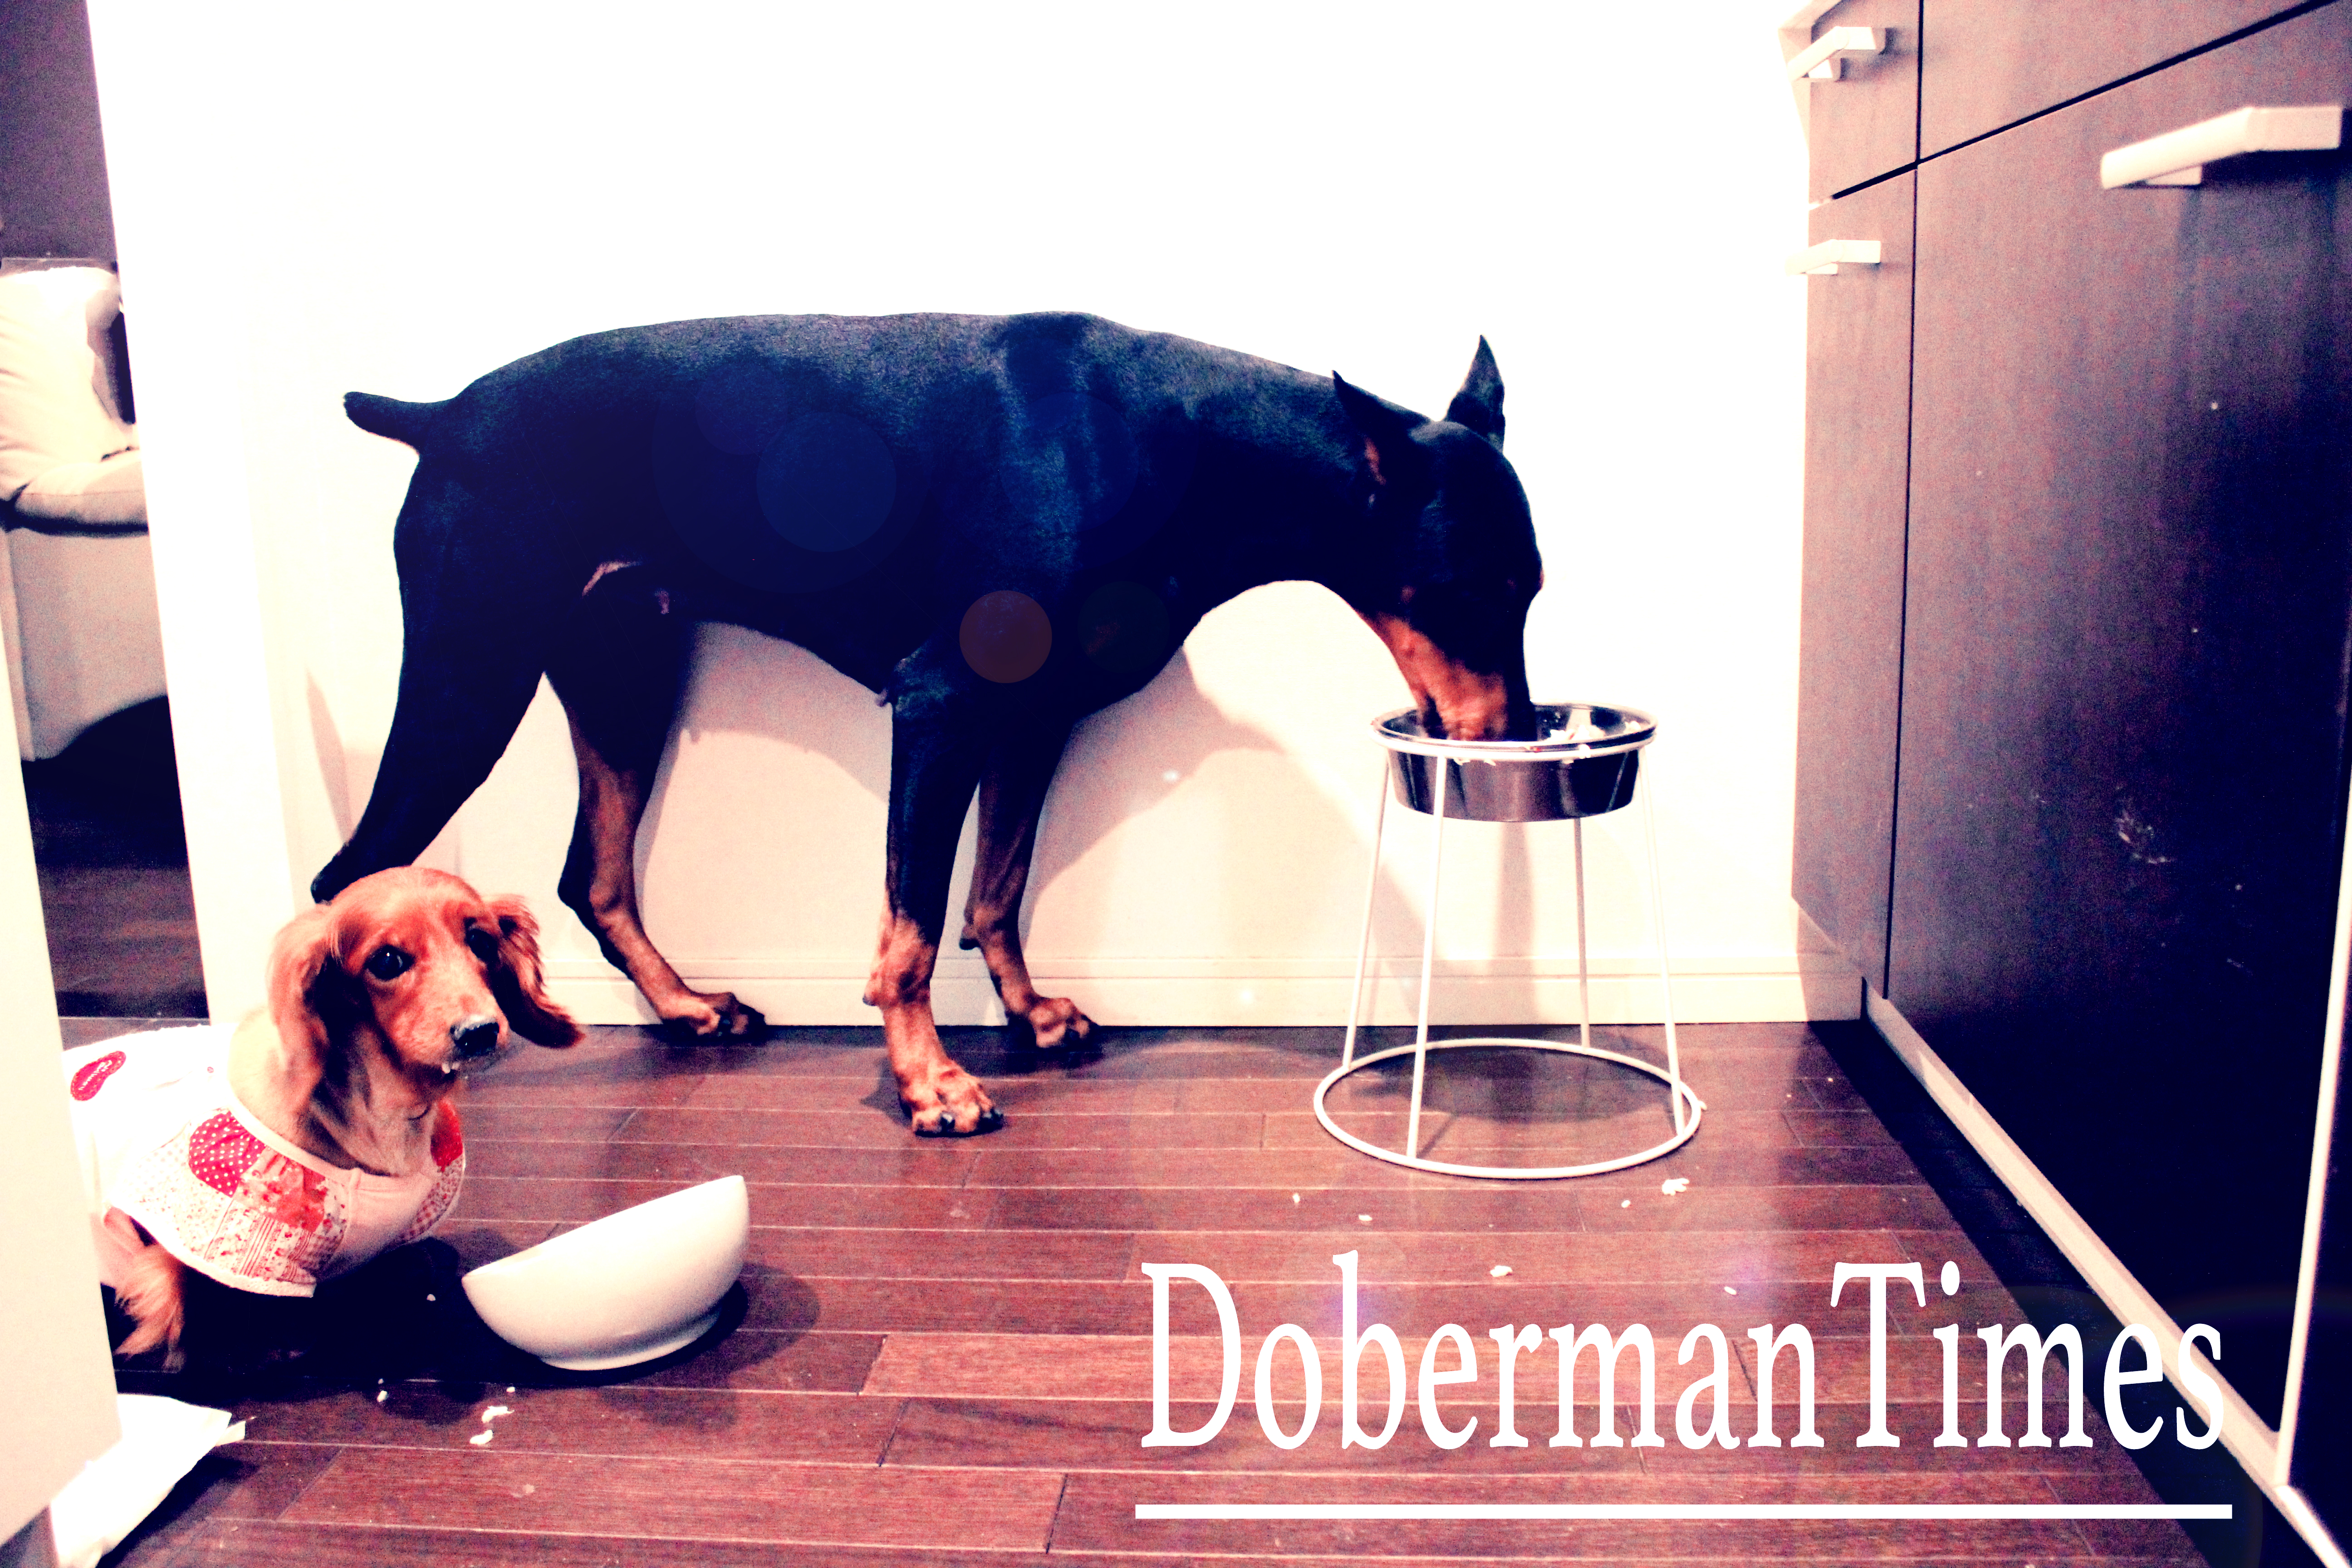 Doberman2歳・♀&M.Dachshund16歳・♀